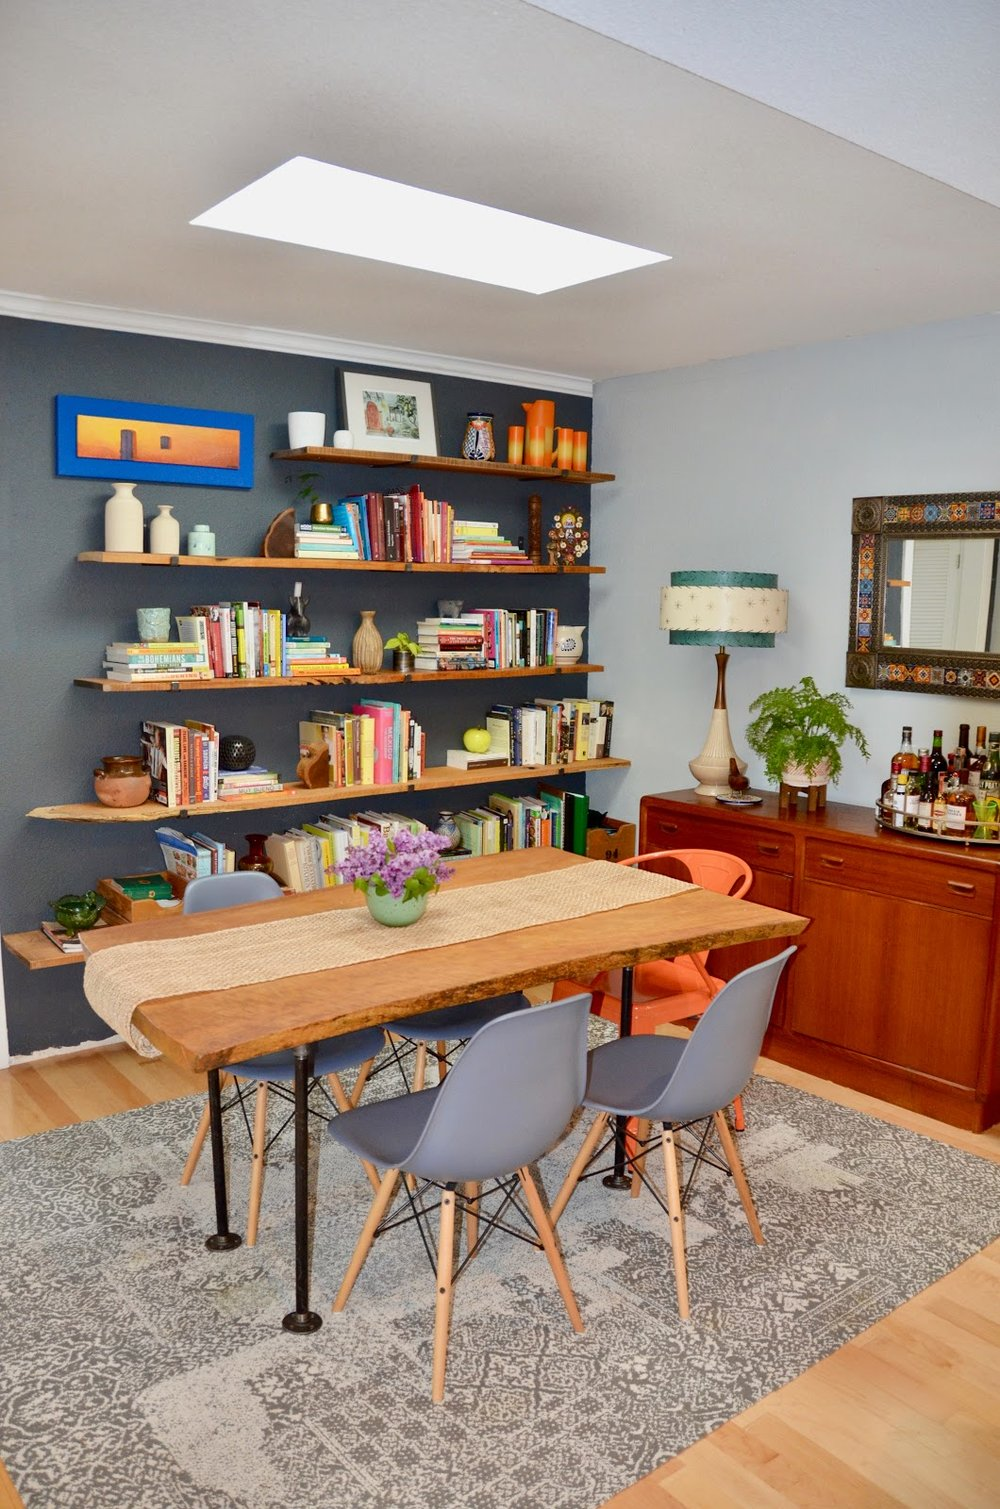 Mid Century Modern Kitchen & Dining Room Remodel - San Leandro, CA